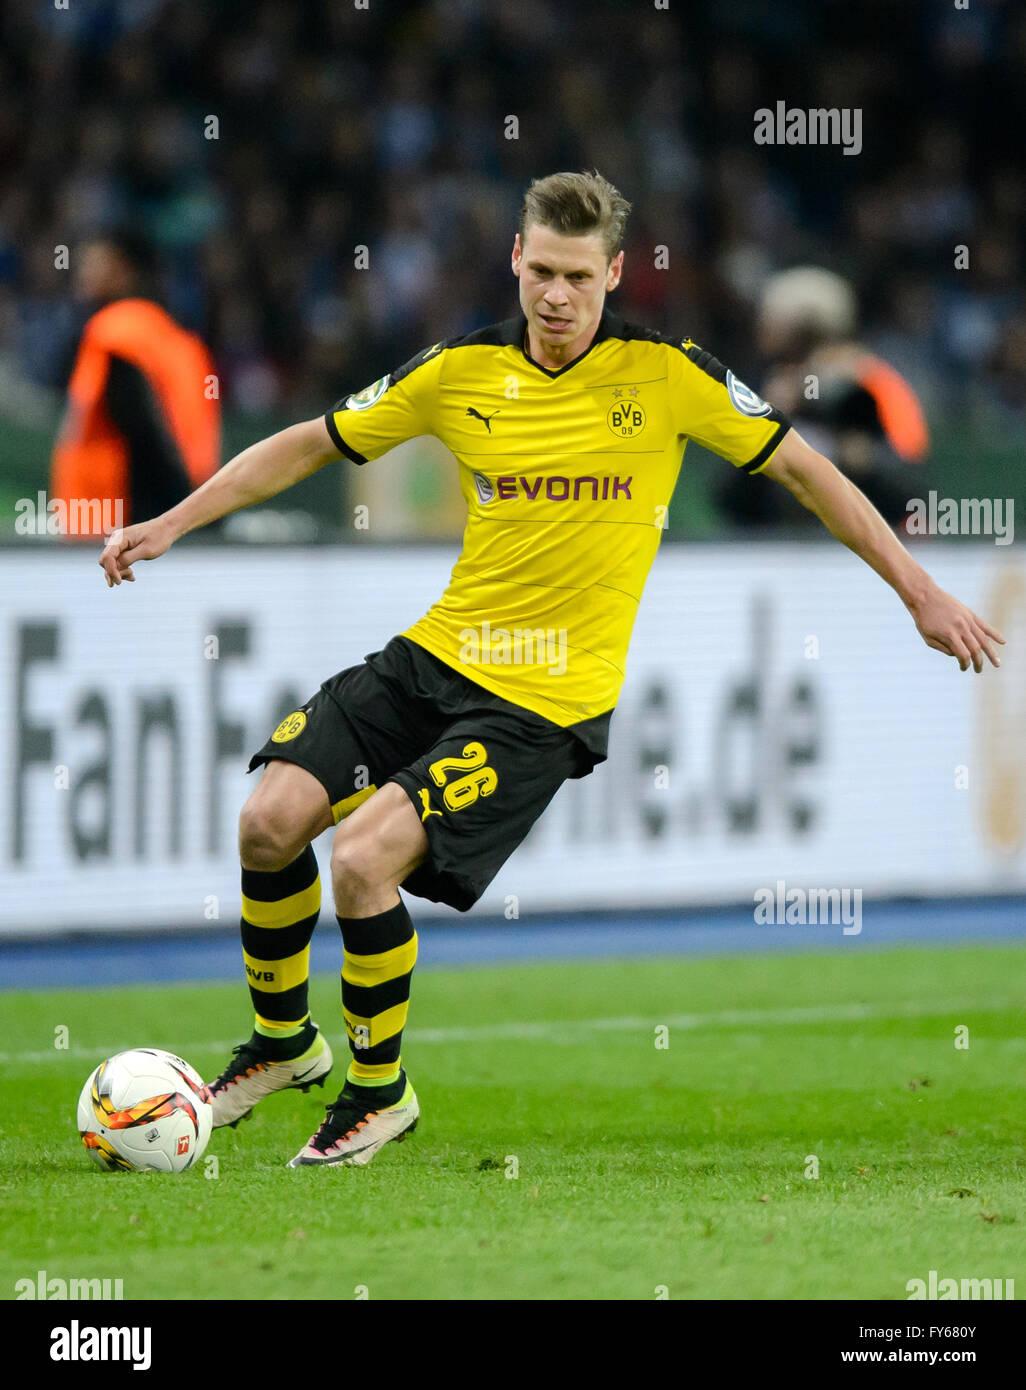 Berlin Germany 20th Apr 2016 Dortmund s Lukasz Piszczek in